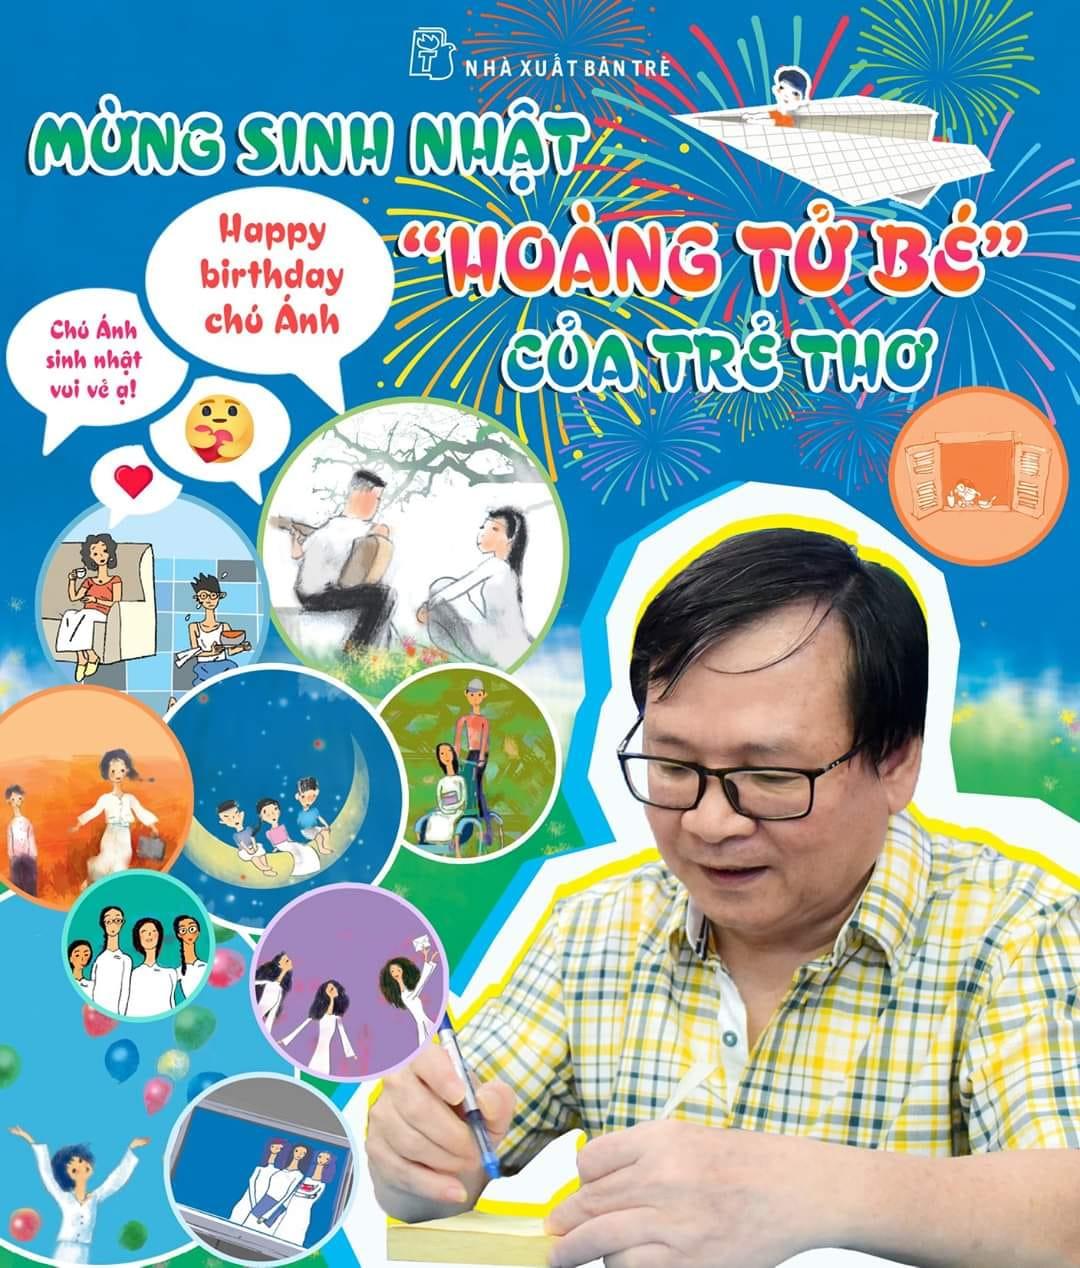 Nguyen nhat Anh